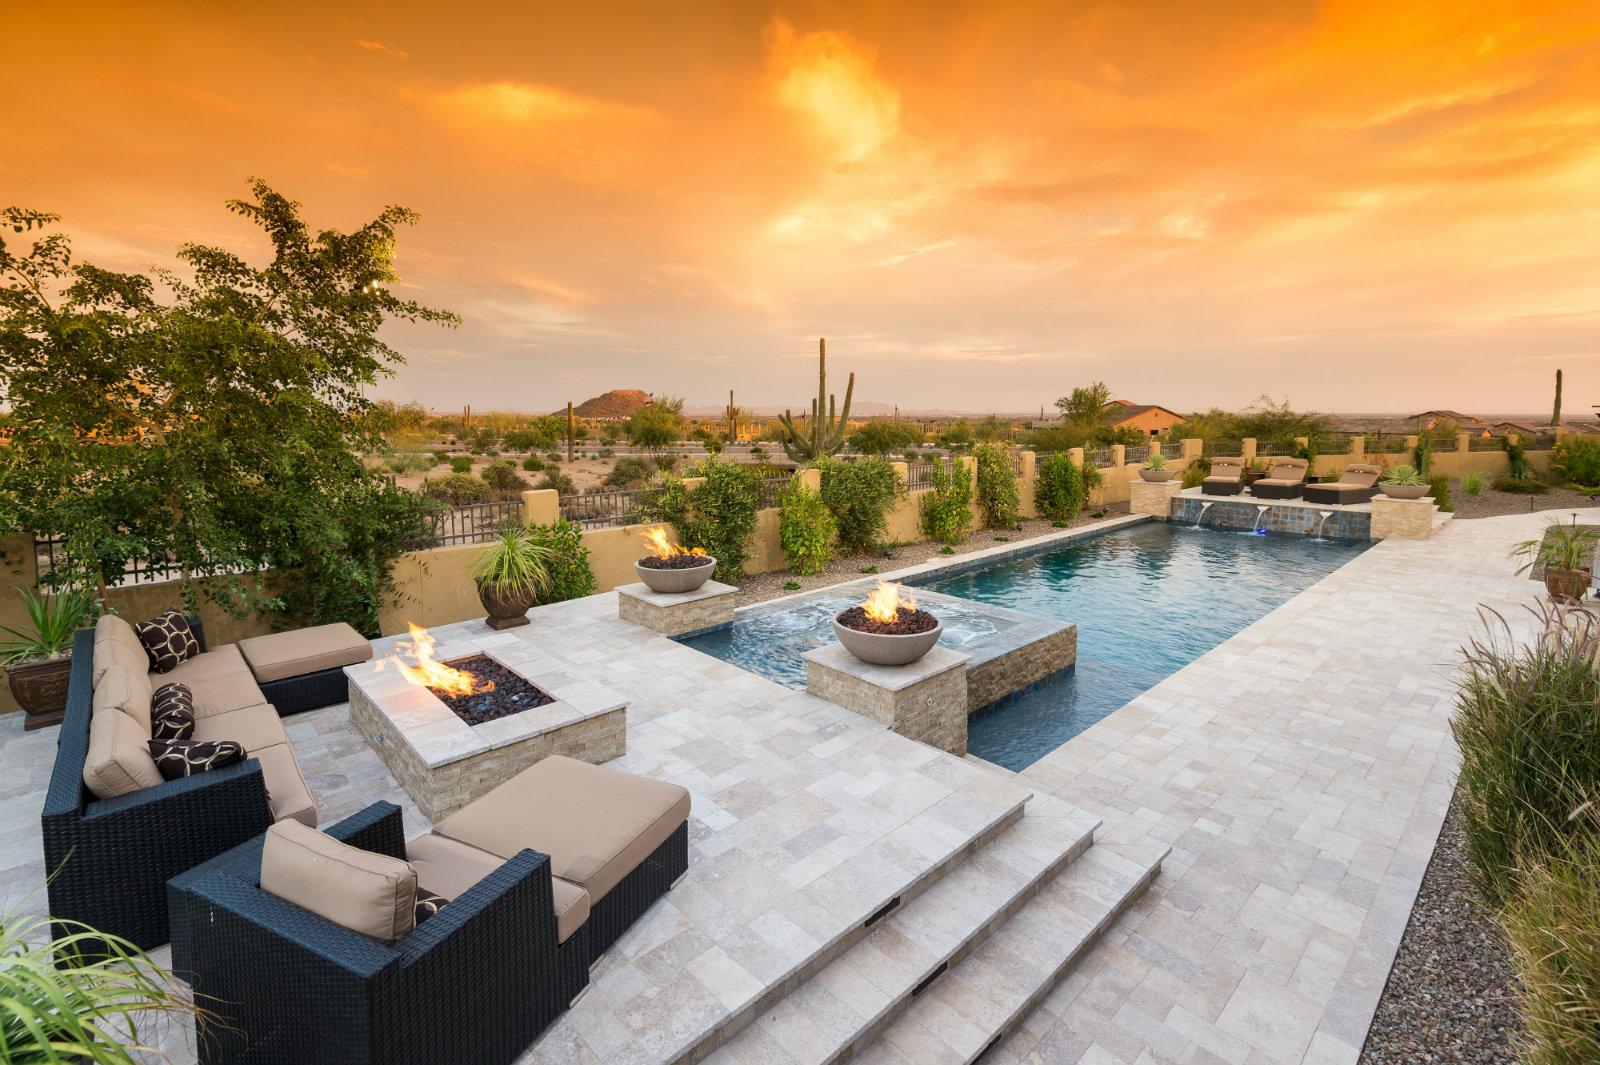 California Pools Amp Landscape Ranks Third In Customer